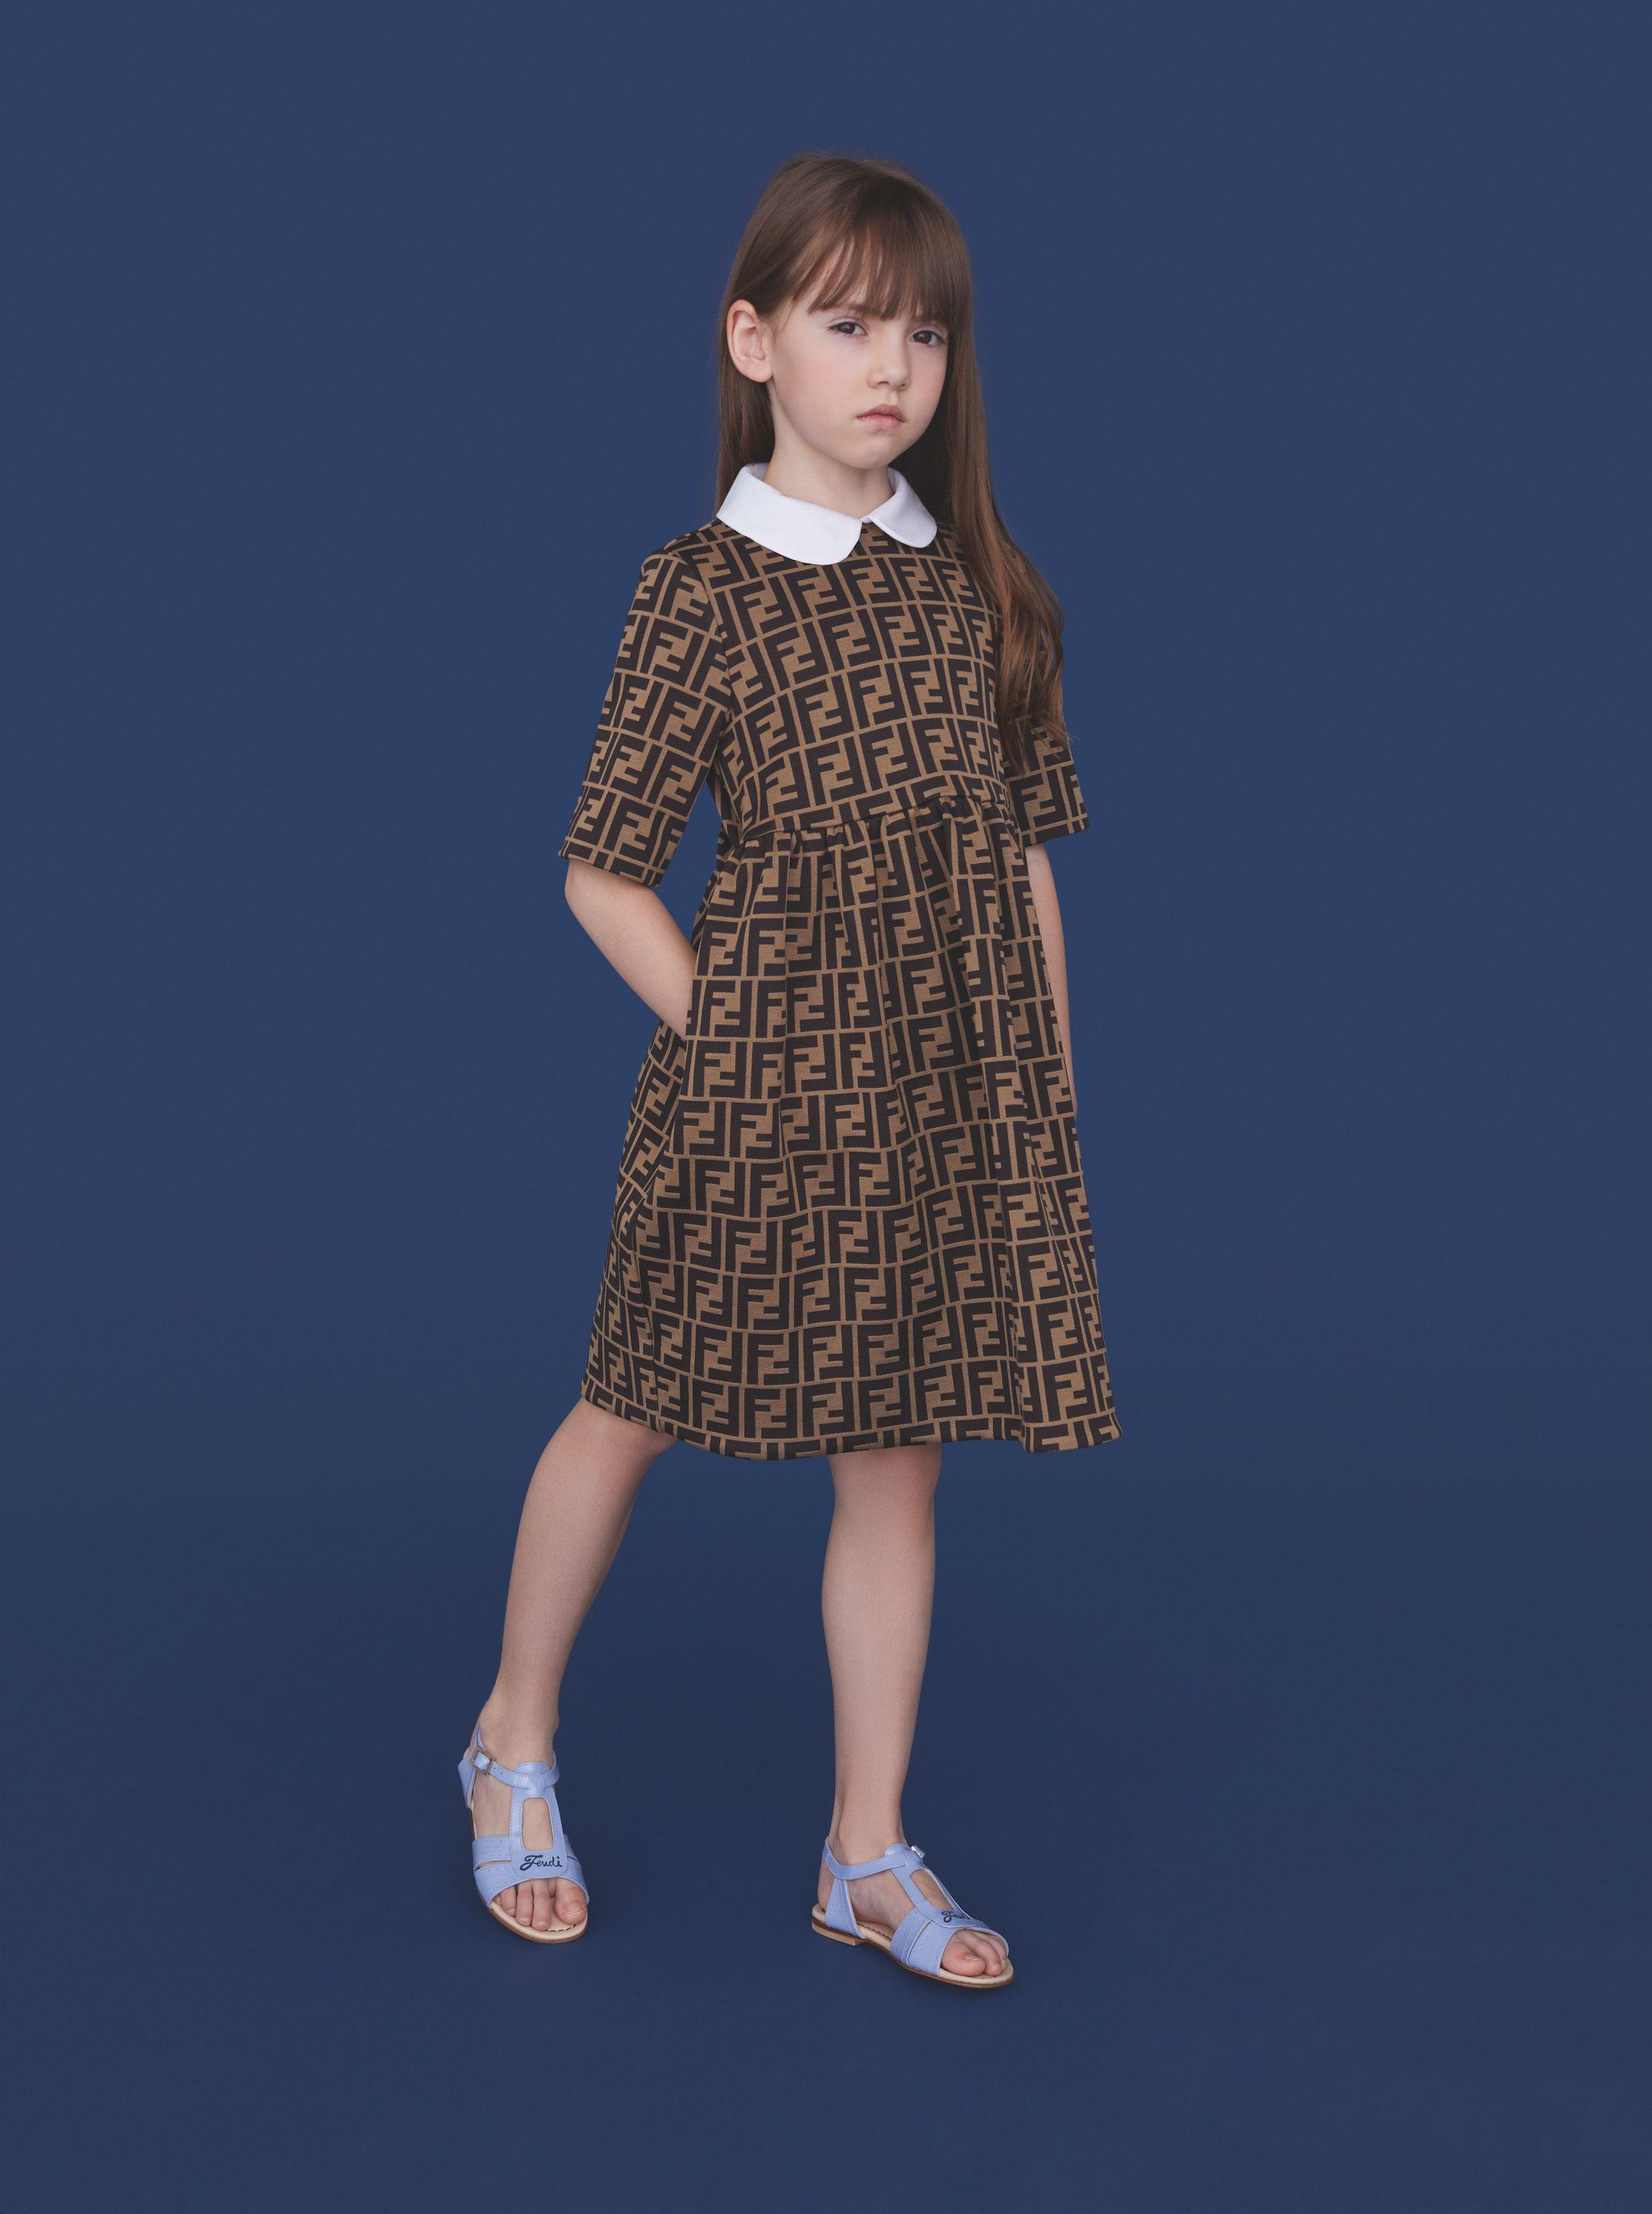 595ec1e668 Fendi Kids Spring/Summer 2019 Collection | Children's Dope Clothes ...